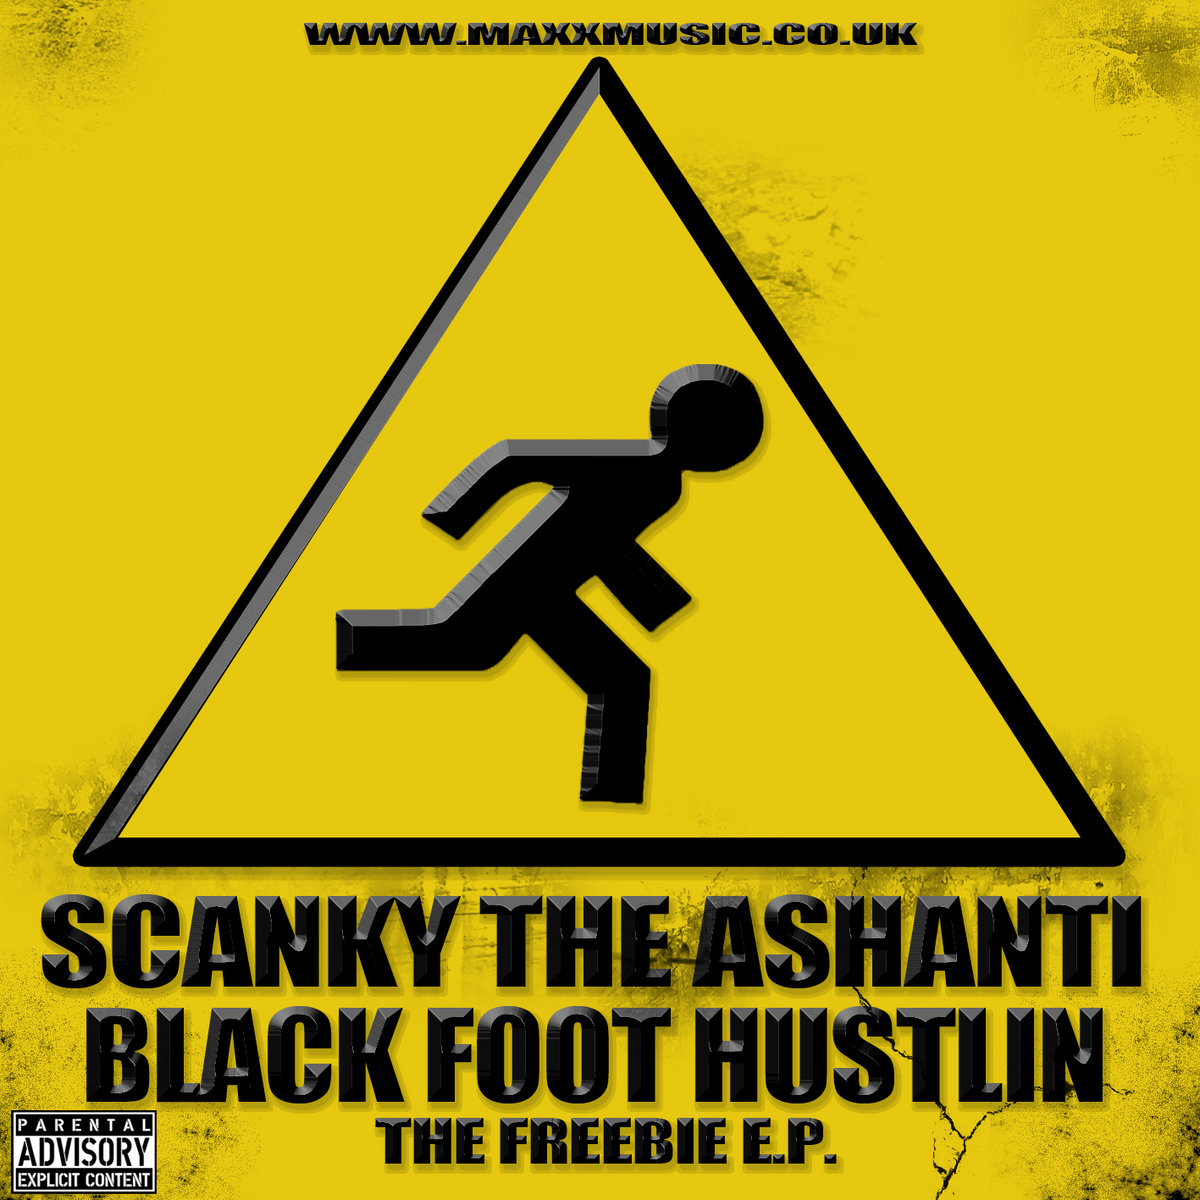 Scanky The Ashanti image